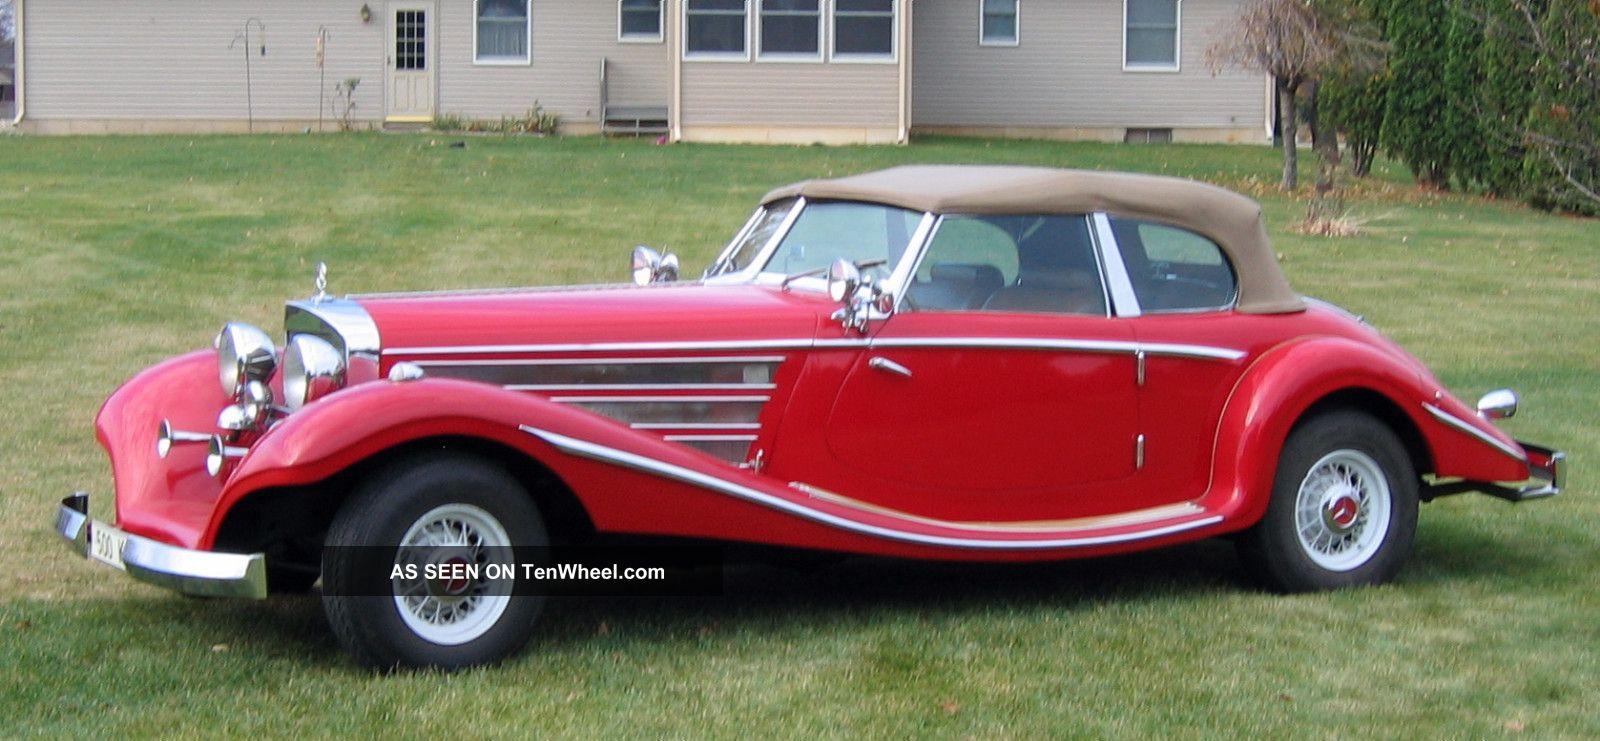 1935 Mercedes 500 K Replica Car All - Steel Body 2 - Door Convertible Automatic Replica/Kit Makes photo